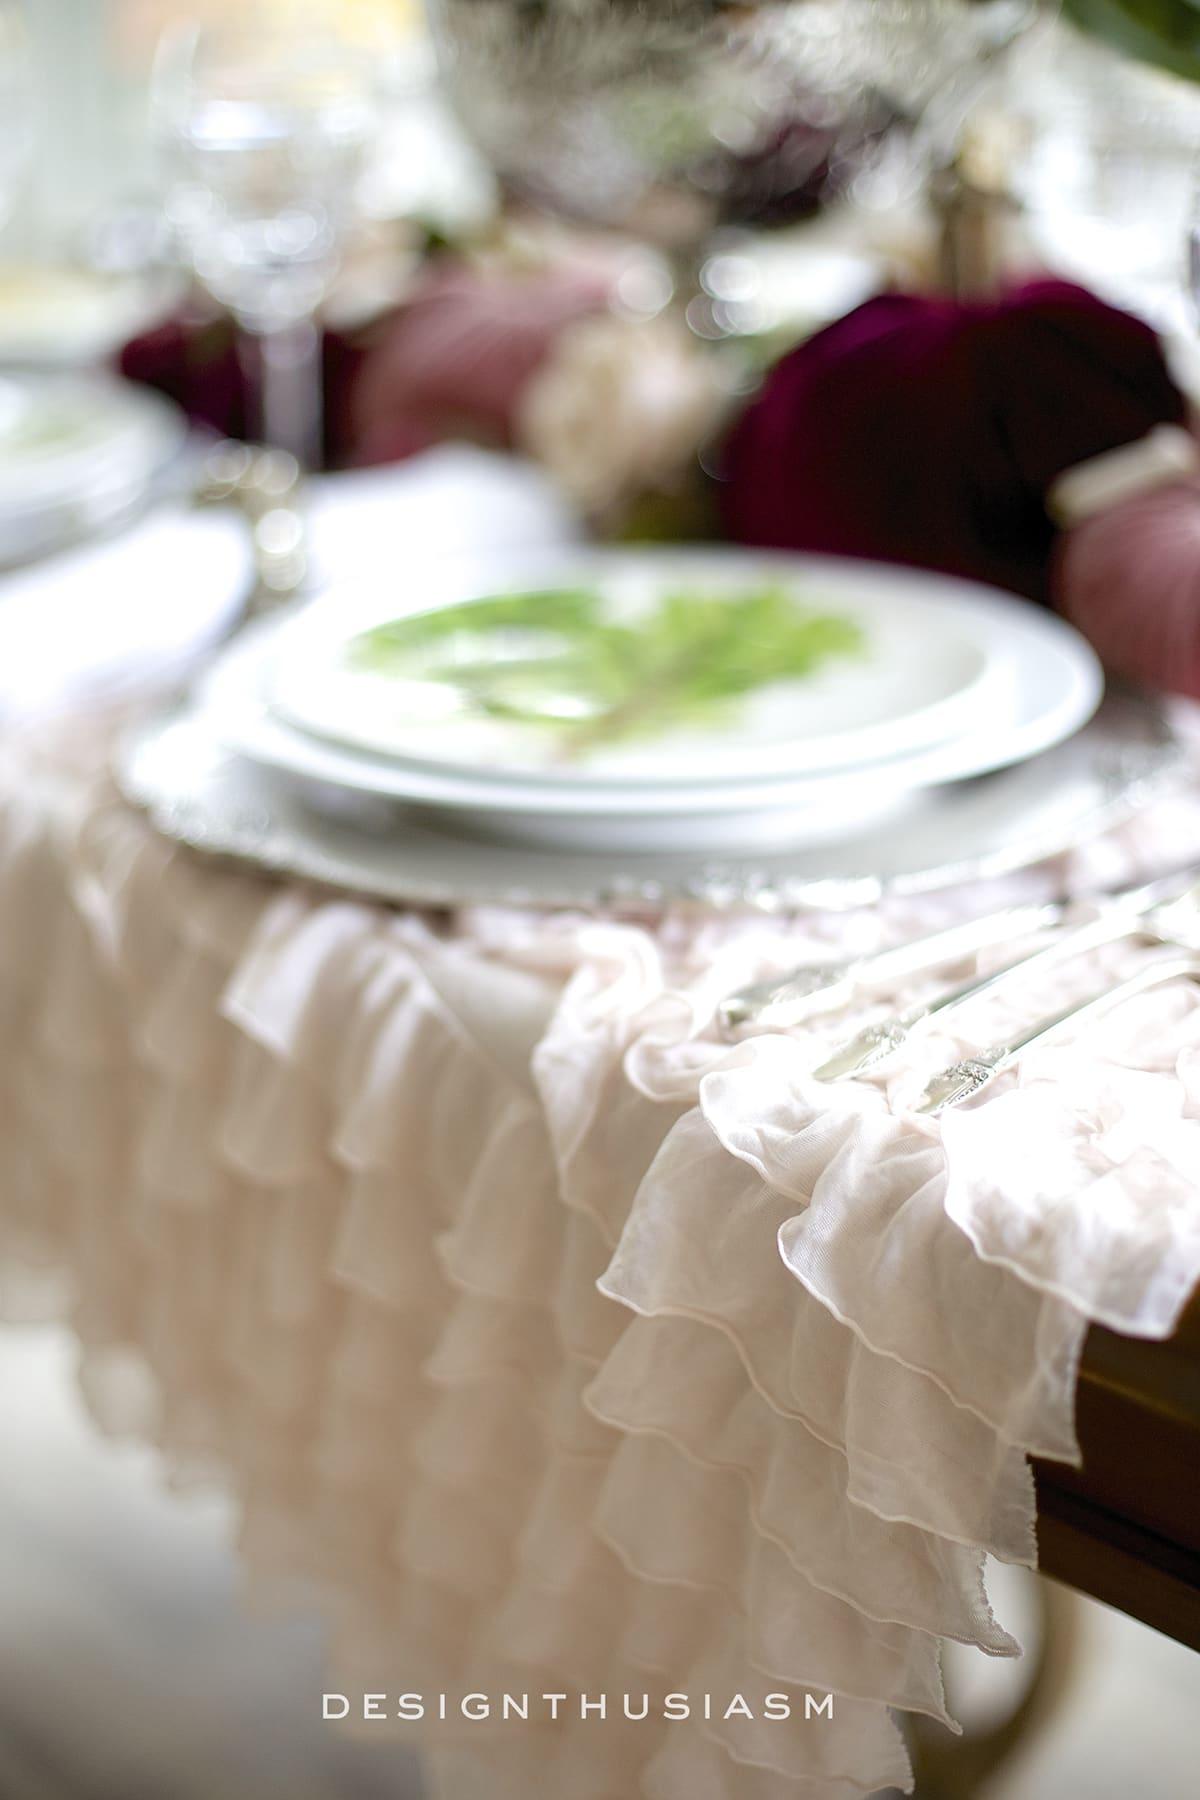 Using Velvet Pumpkins in an Elegant Fall Tablescape   Designthusiasm.com